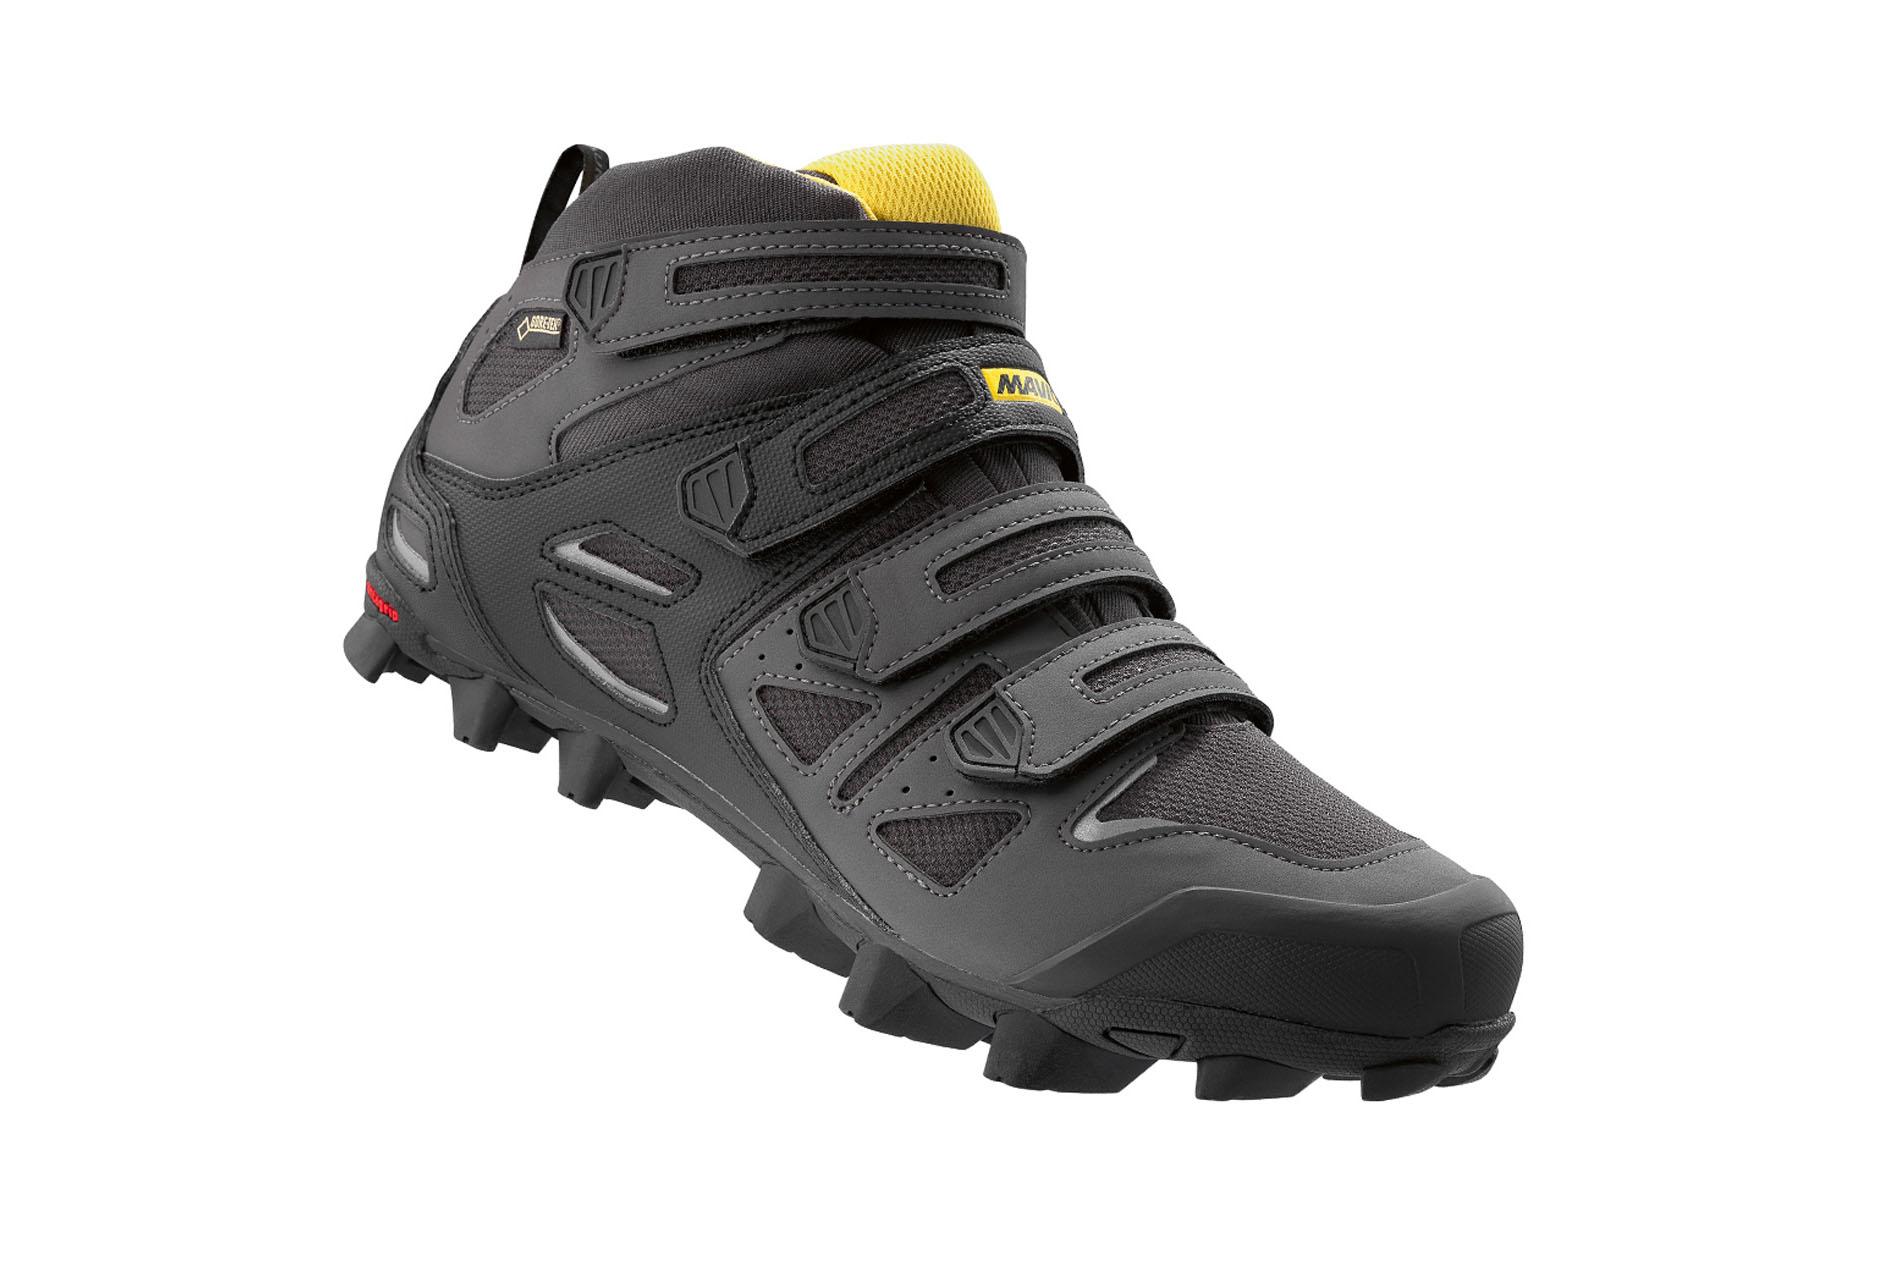 Chaussures Mavic noires KIygE3